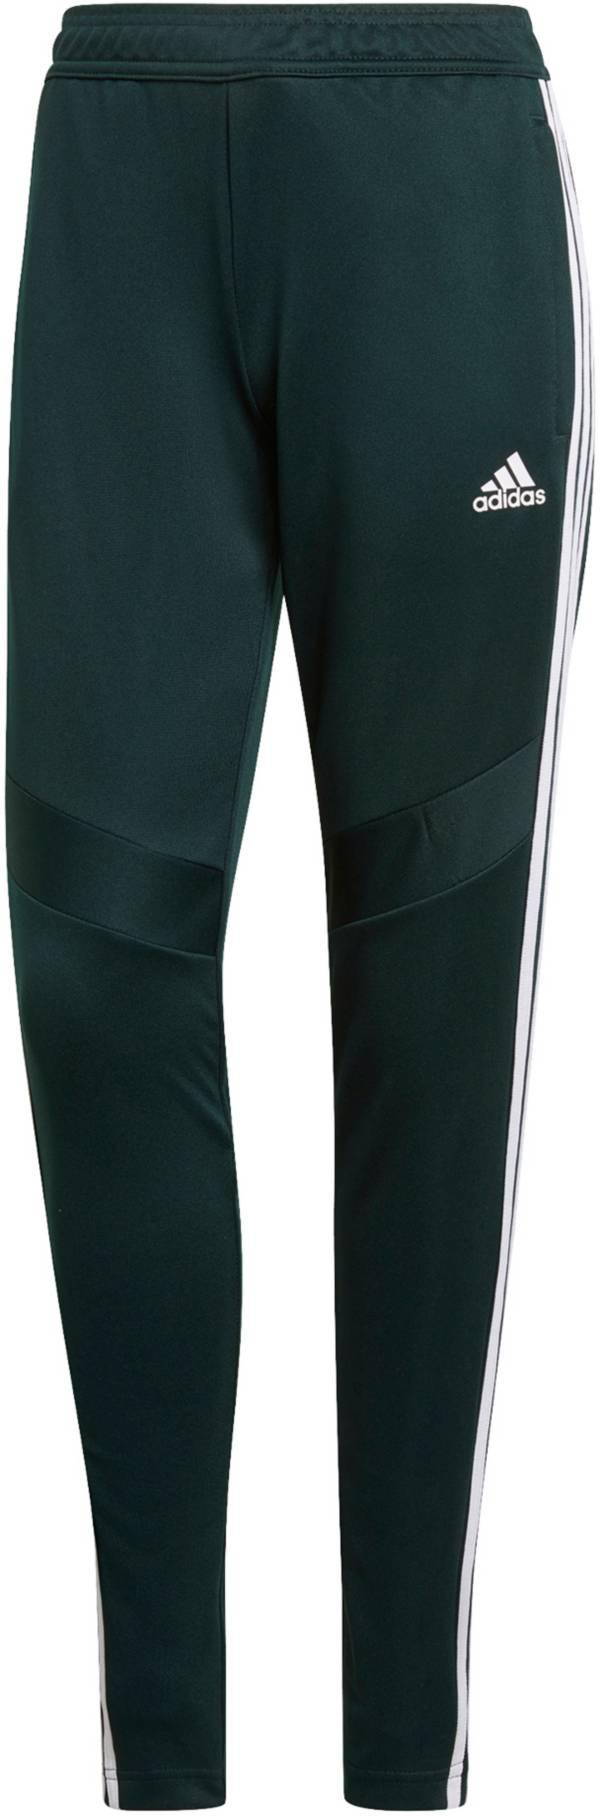 adidas Women's Tiro 19 Training Pants product image